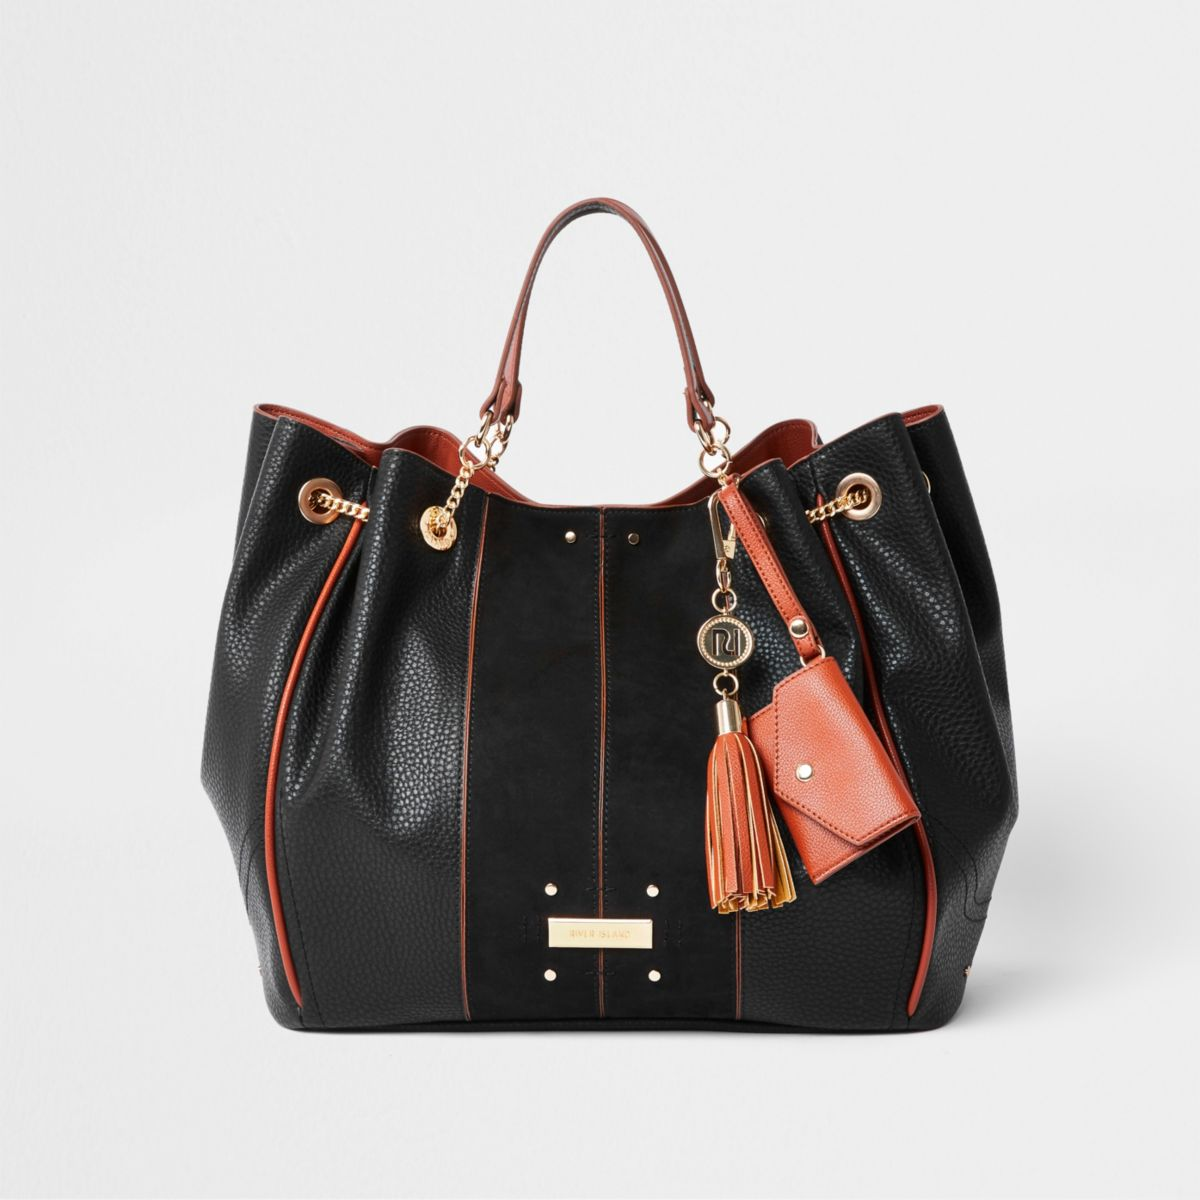 Black tassel chain underarm slouch bag